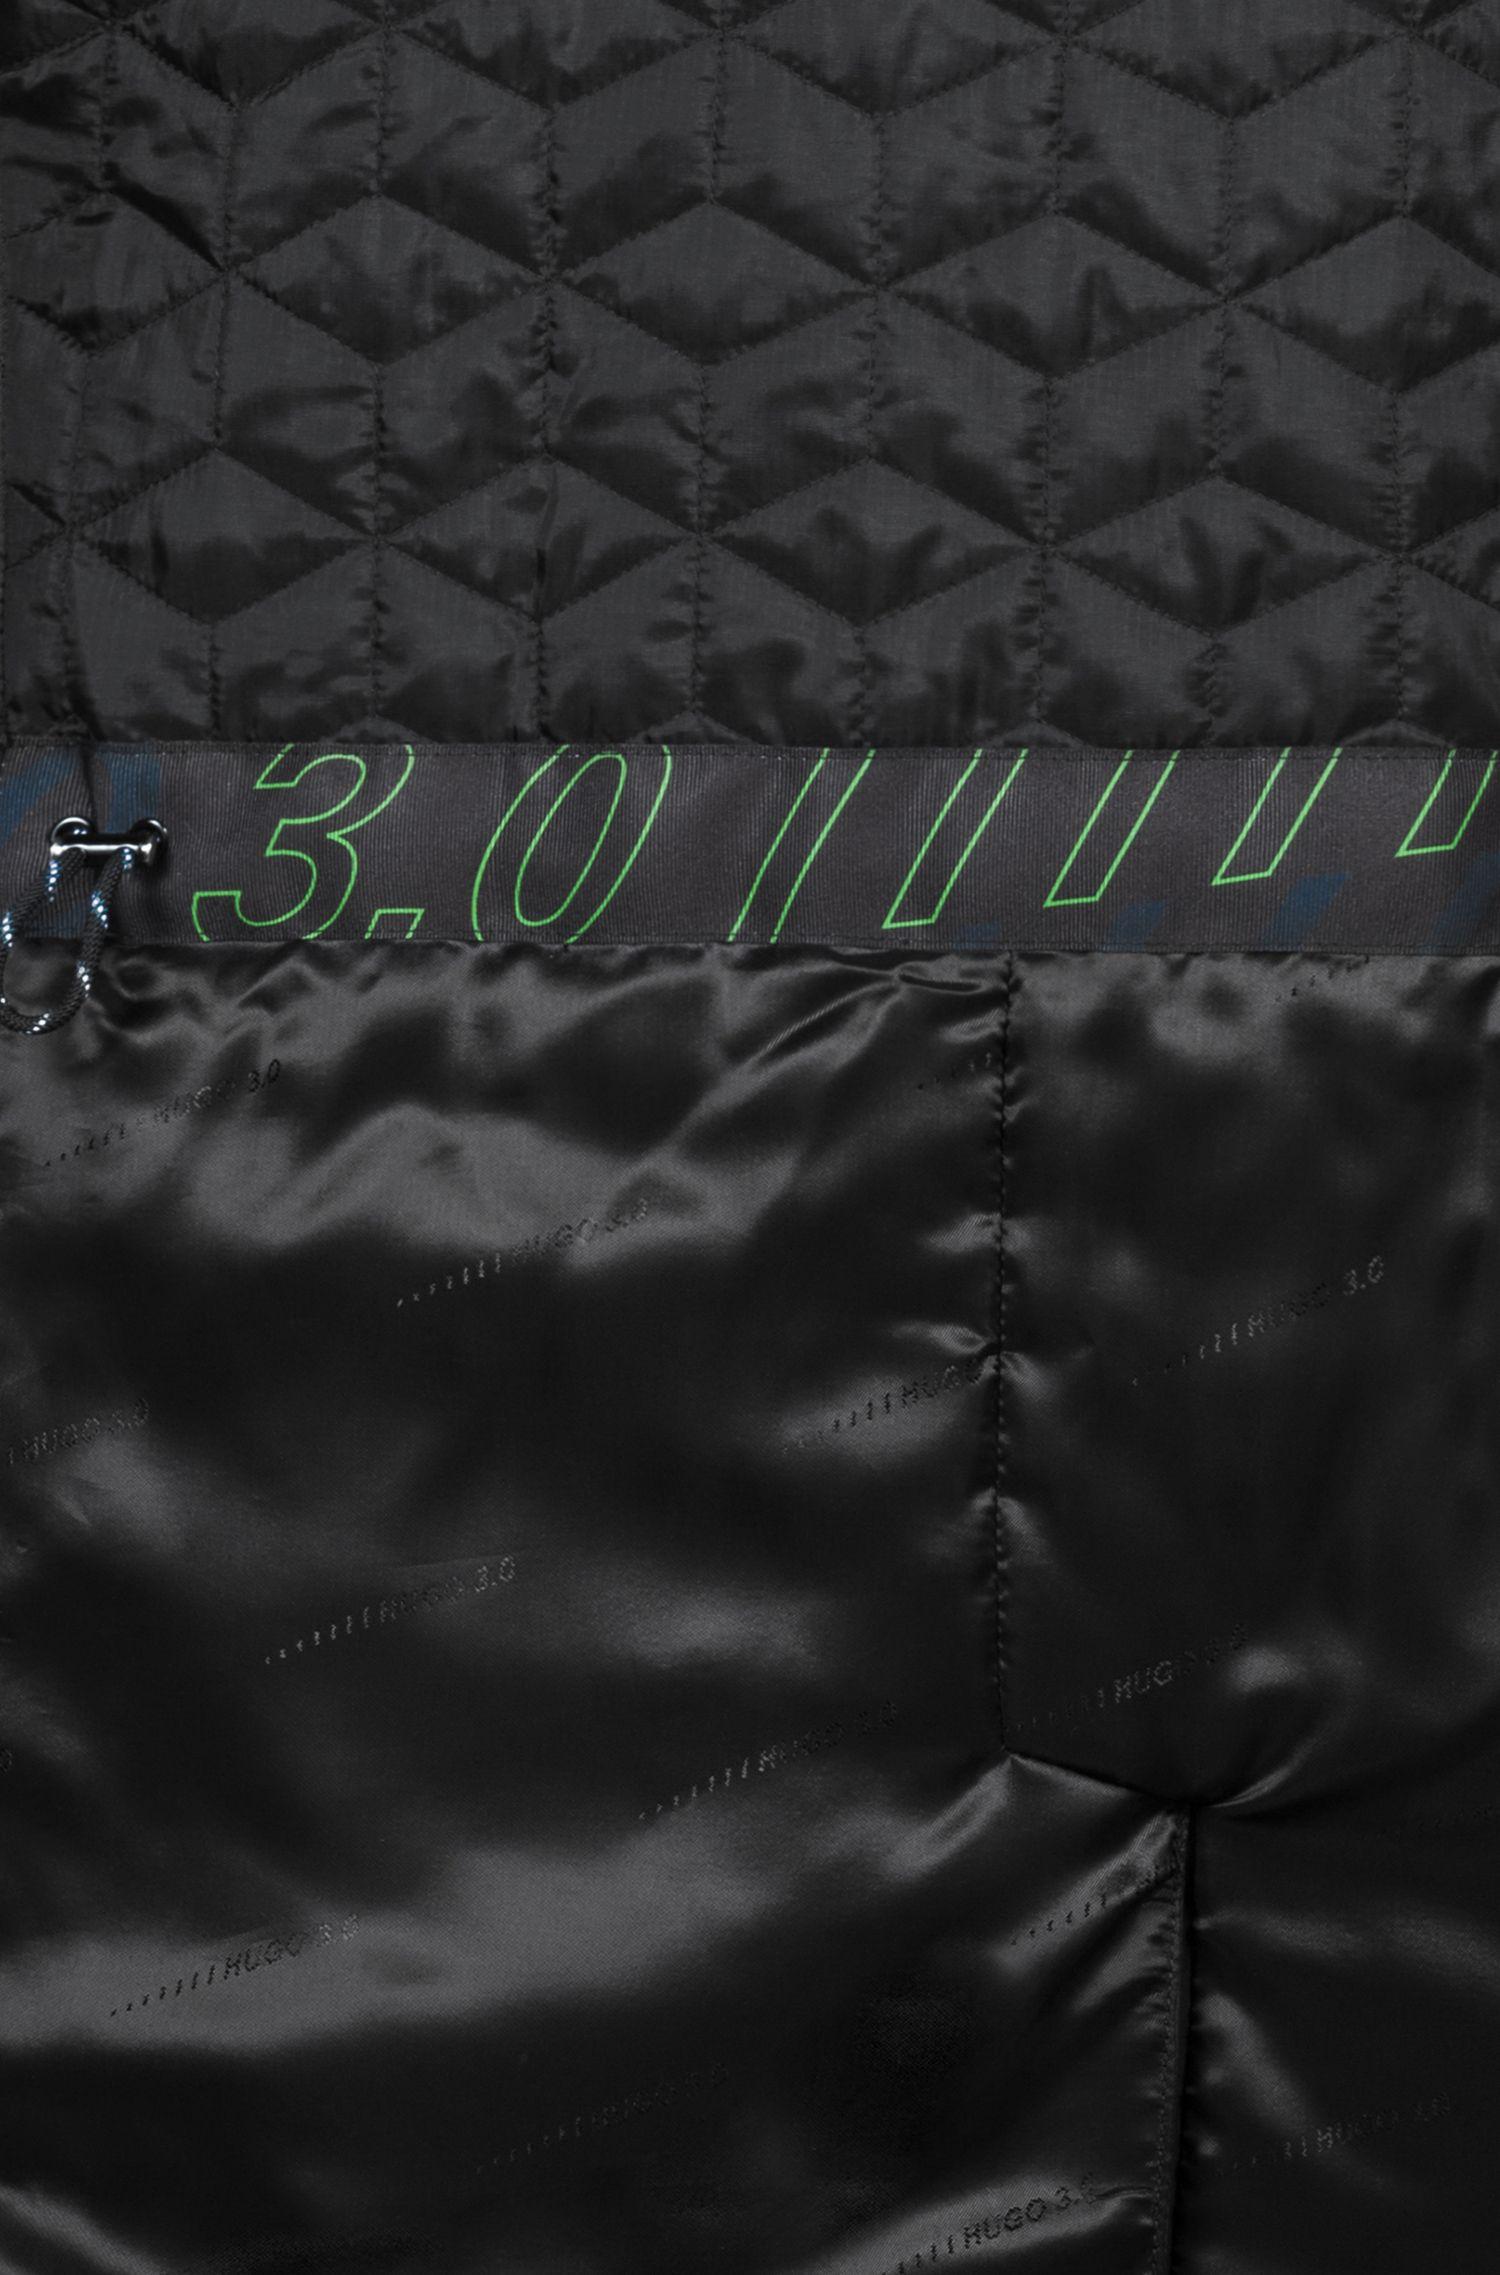 Mantel van waterafstotend materiaal uit de Bits & Bytes-capsule, Donkerblauw